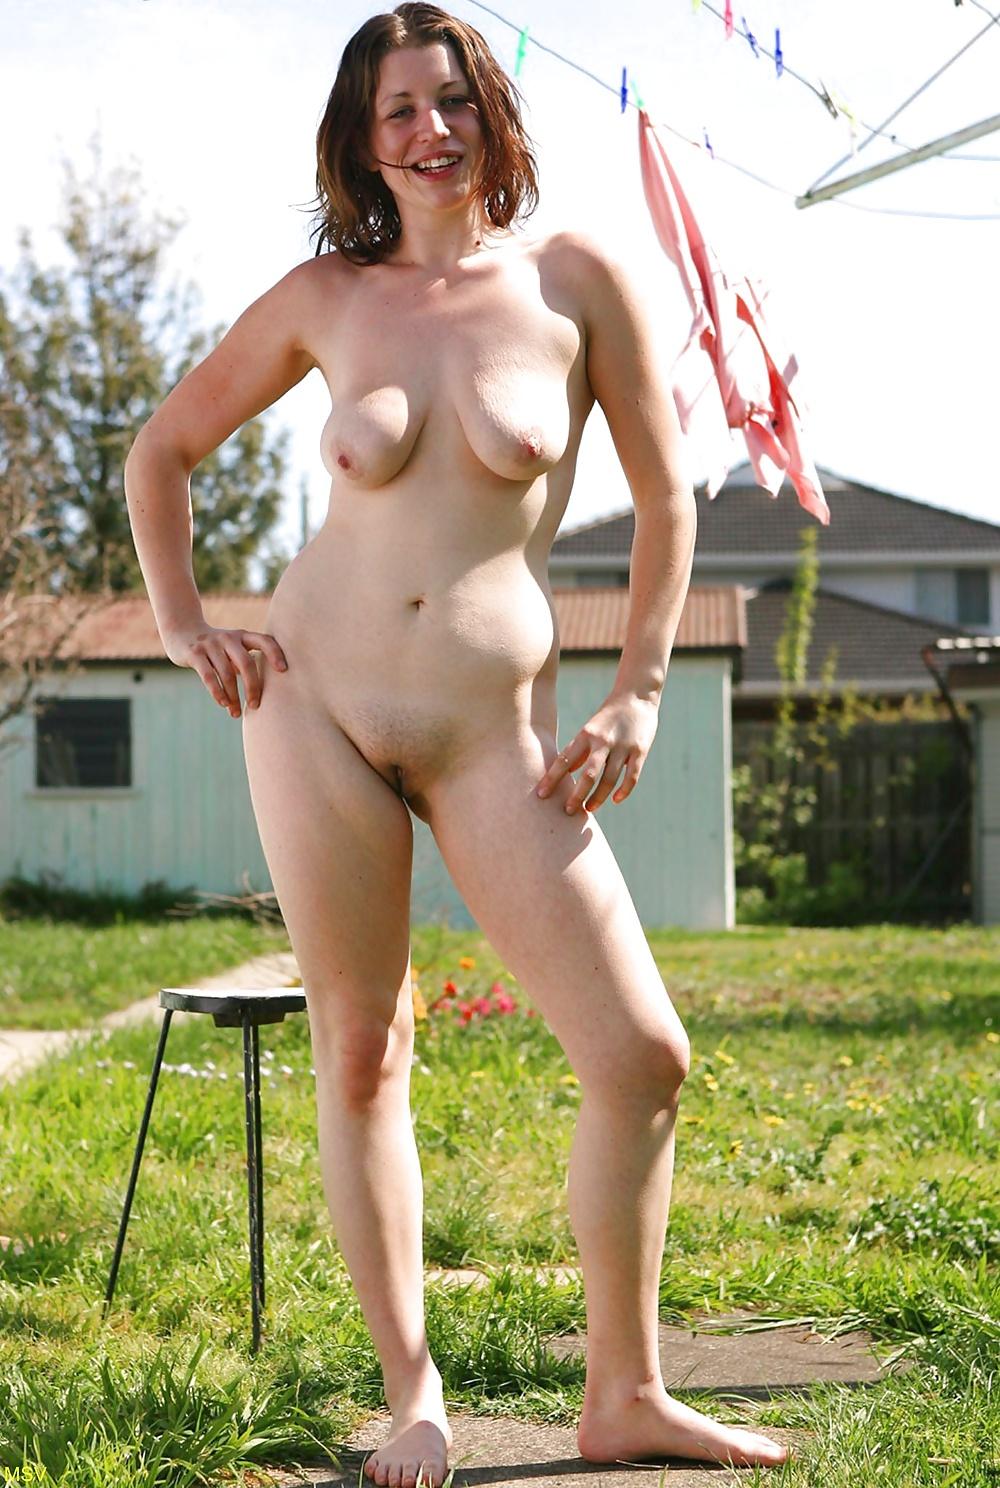 women-nude-in-the-backyard-handjob-of-the-day